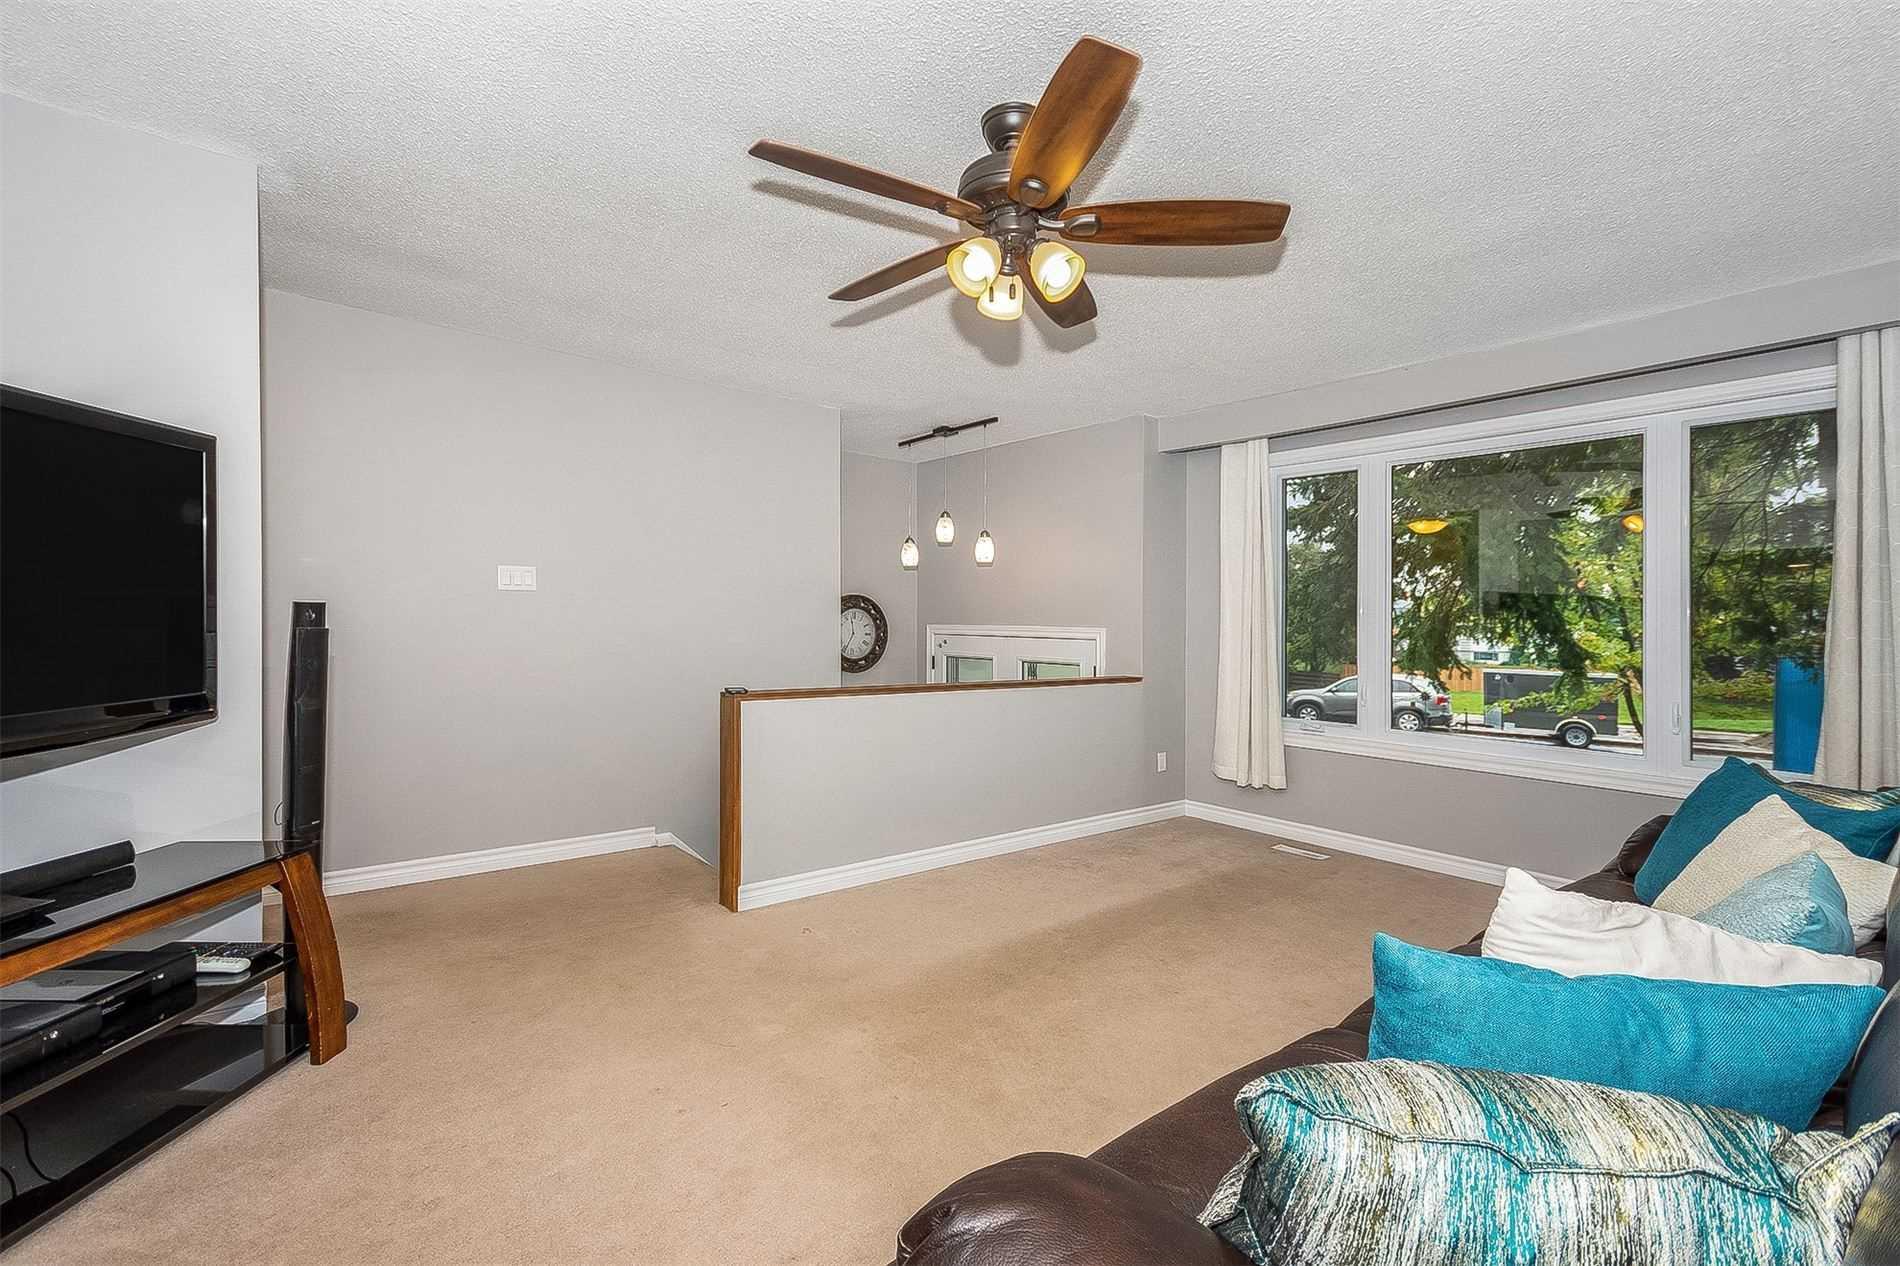 271 Mcdonald Blvd, Halton Hills W4597488